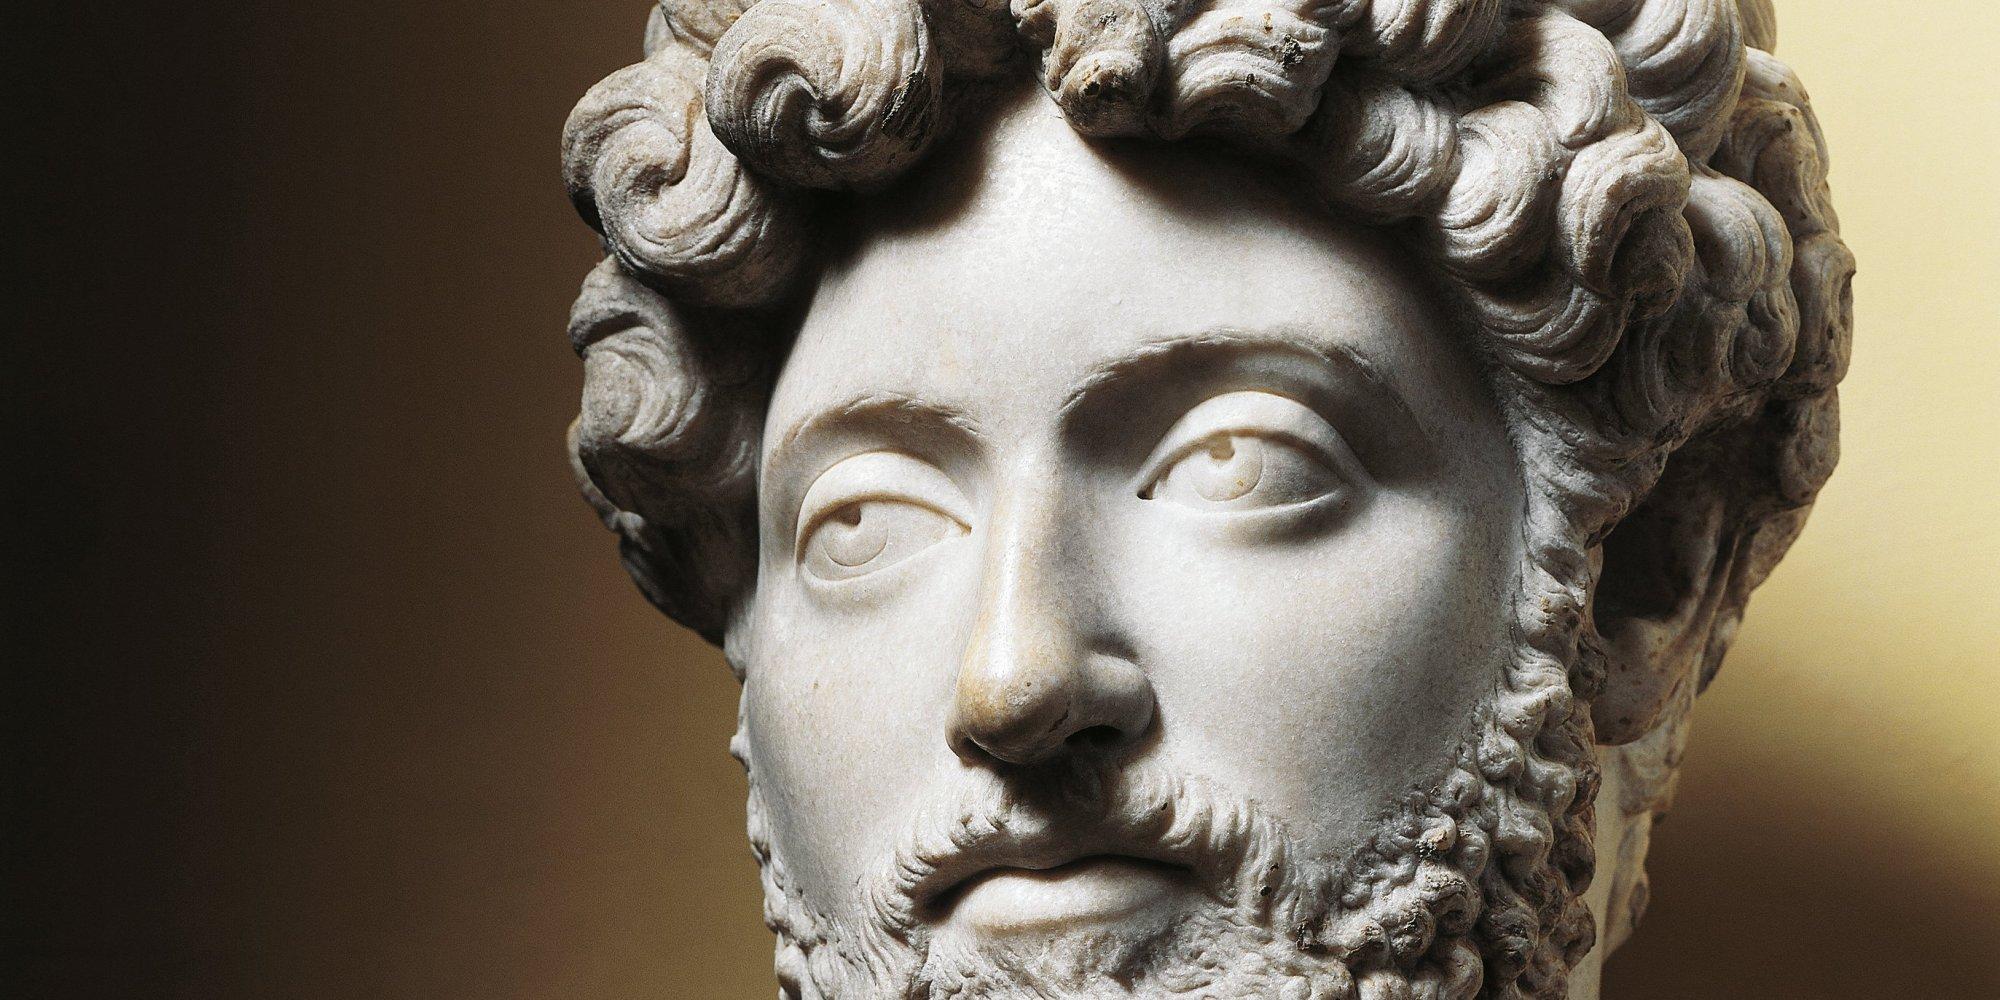 marcus aurelius the philosopher emperor Marcus aurelius, emperor of rome, 121-180 marcus aurelius antoninus   marcus's benevolent rule and interest in philosophy has garnered him almost.